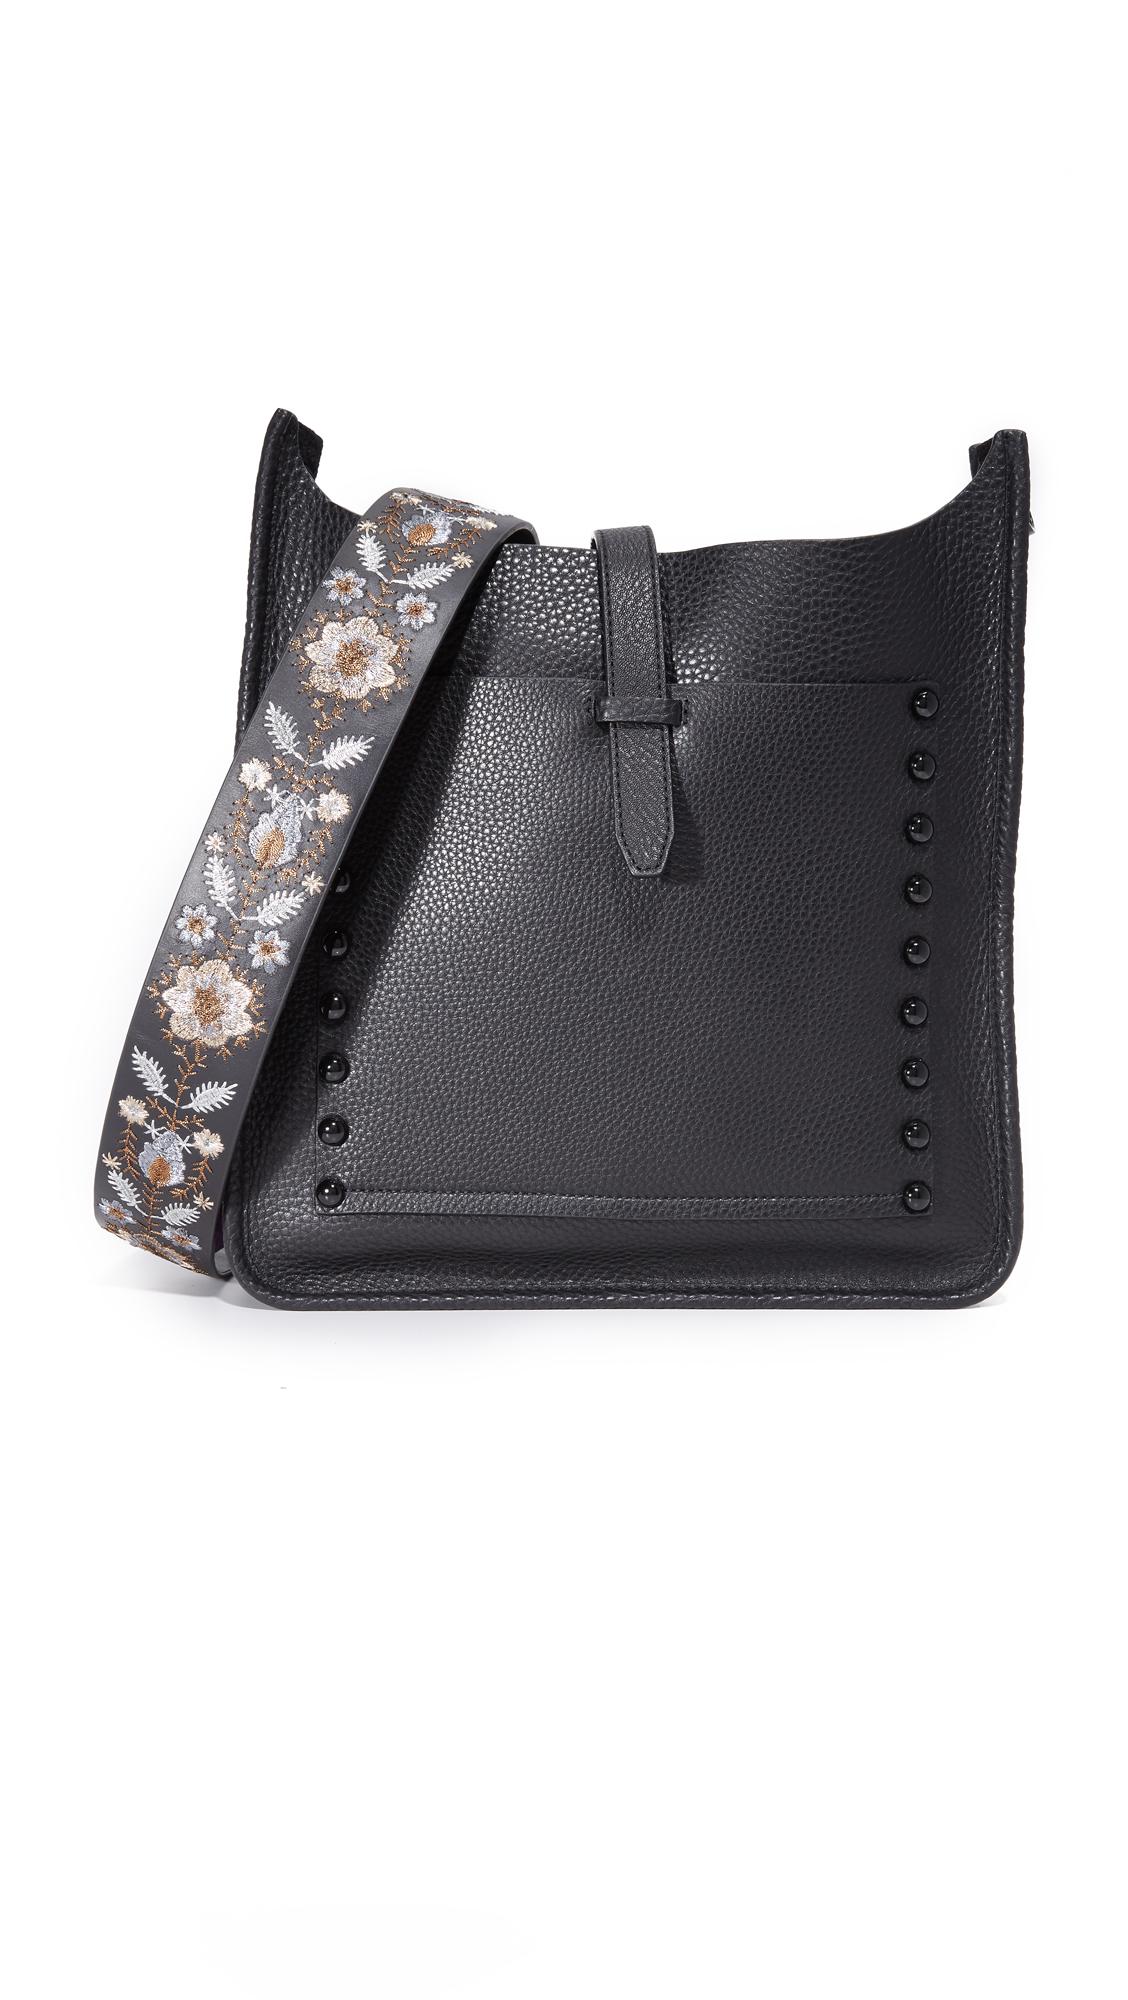 Rebecca Minkoff Floral Leather Guitar Handbag Strap Discount Websites Sale Original Cost Sale Online uNxS3s4xP